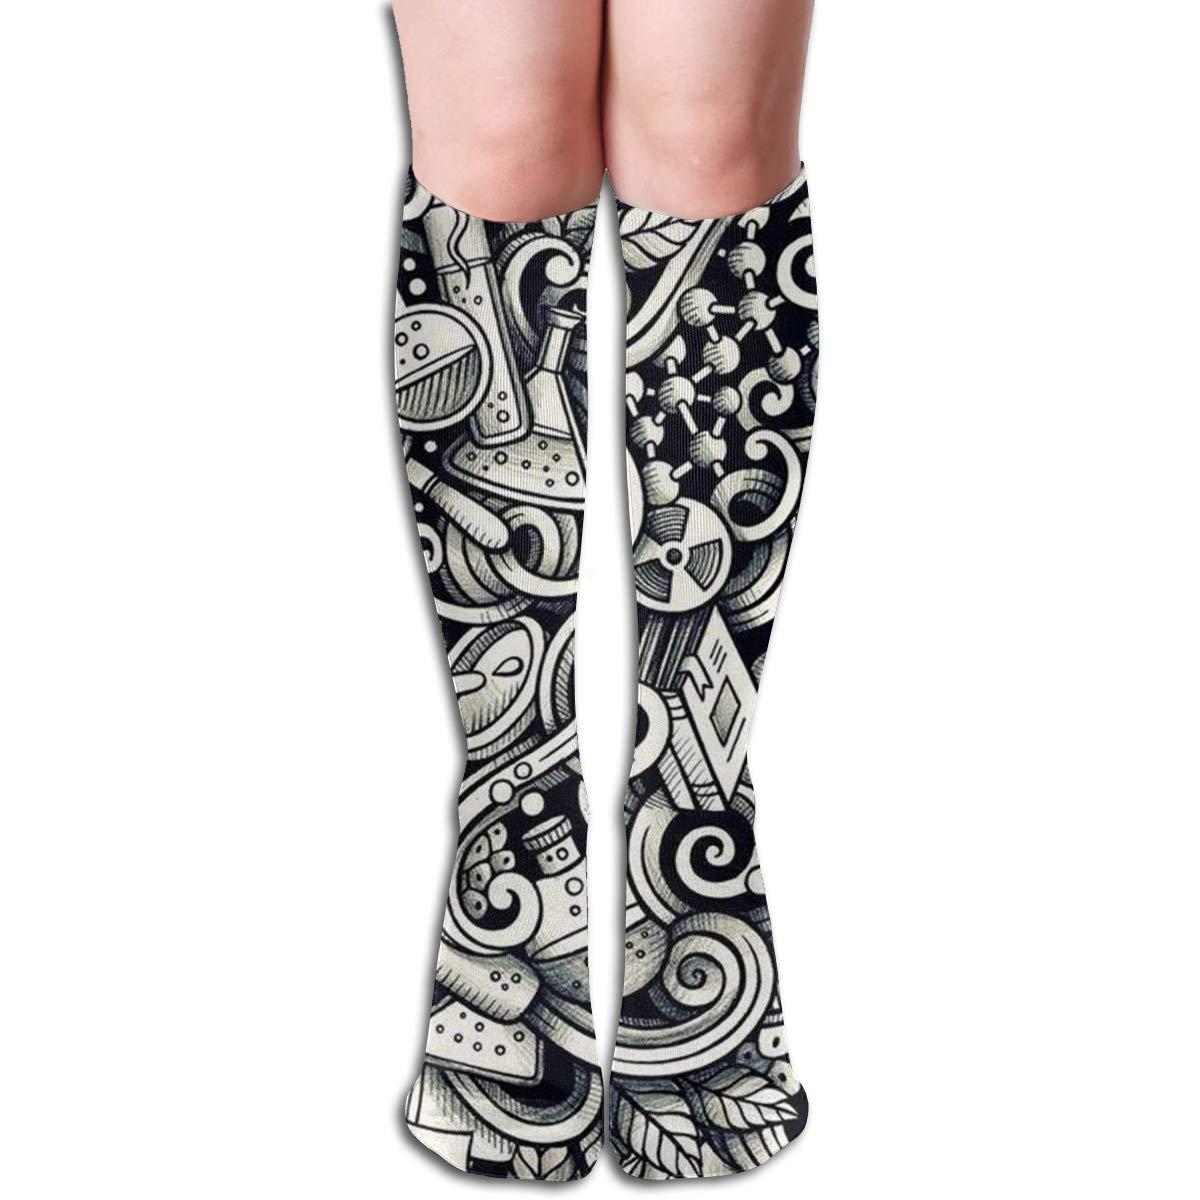 Chemical Sketch Compression Socks For Women Casual Fashion Crew Socks